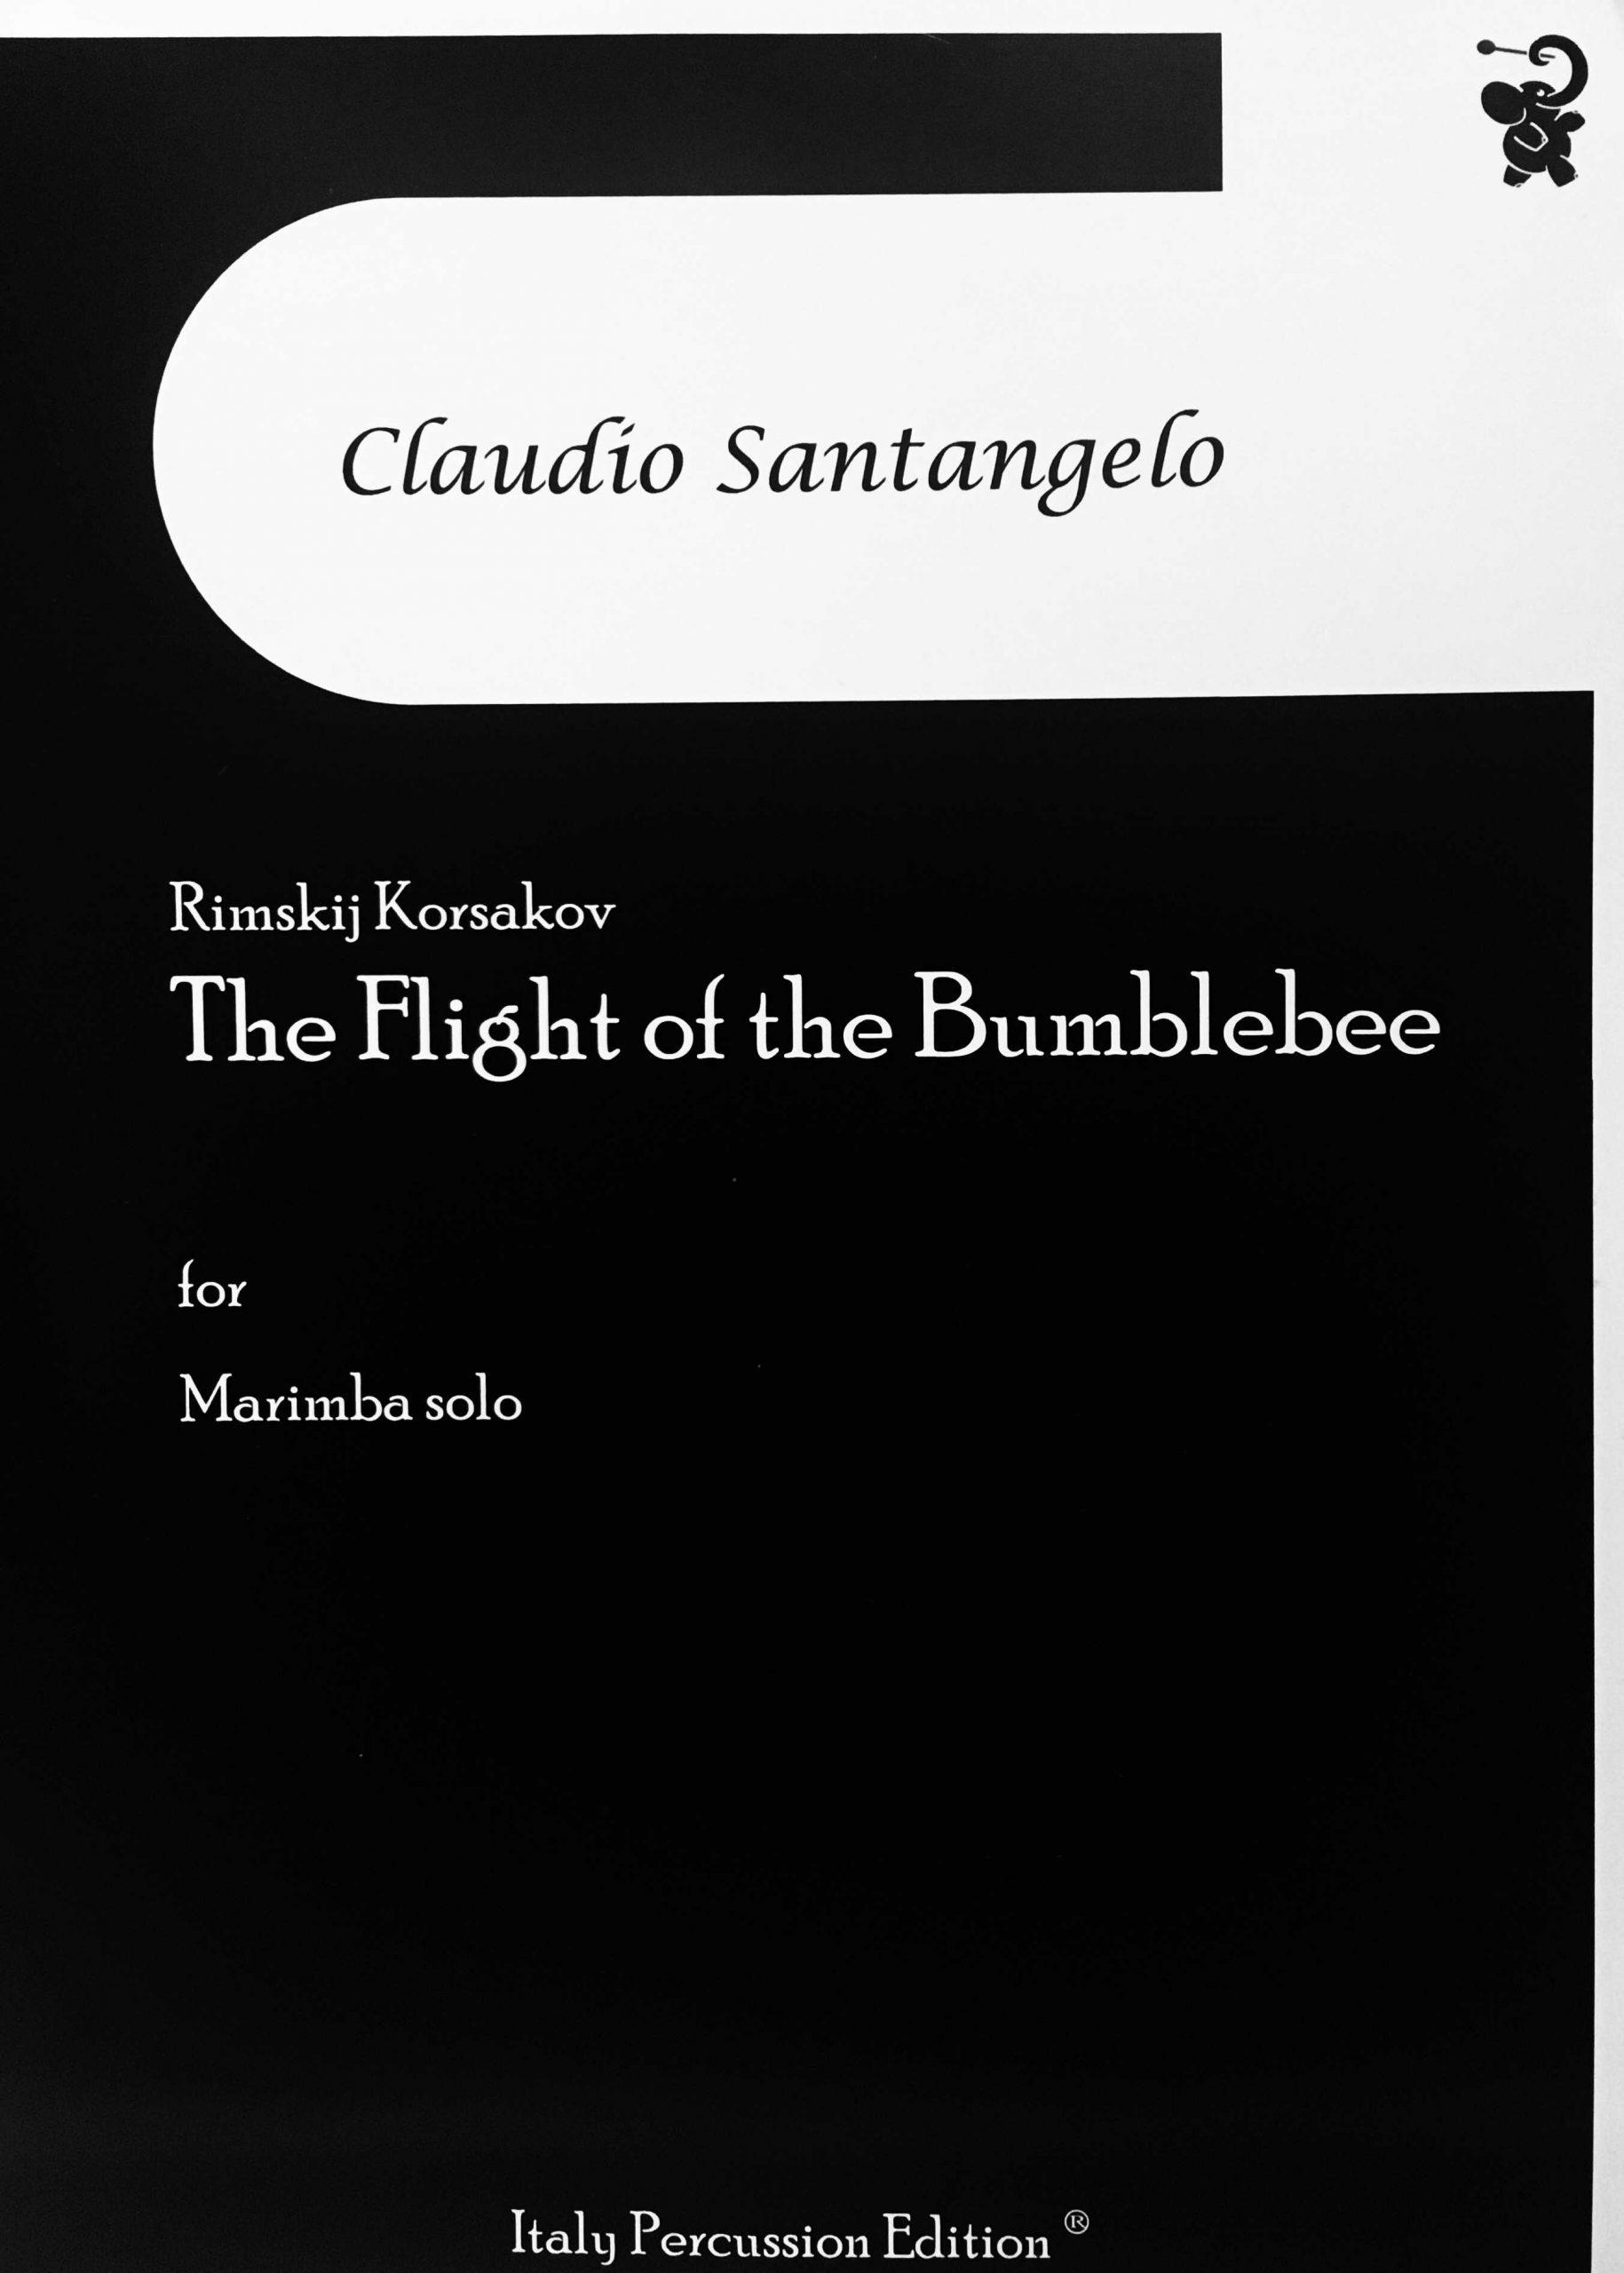 The Flight of the Bumblebee by Rimsky-Korsakov arr. Claudio Santangelo.